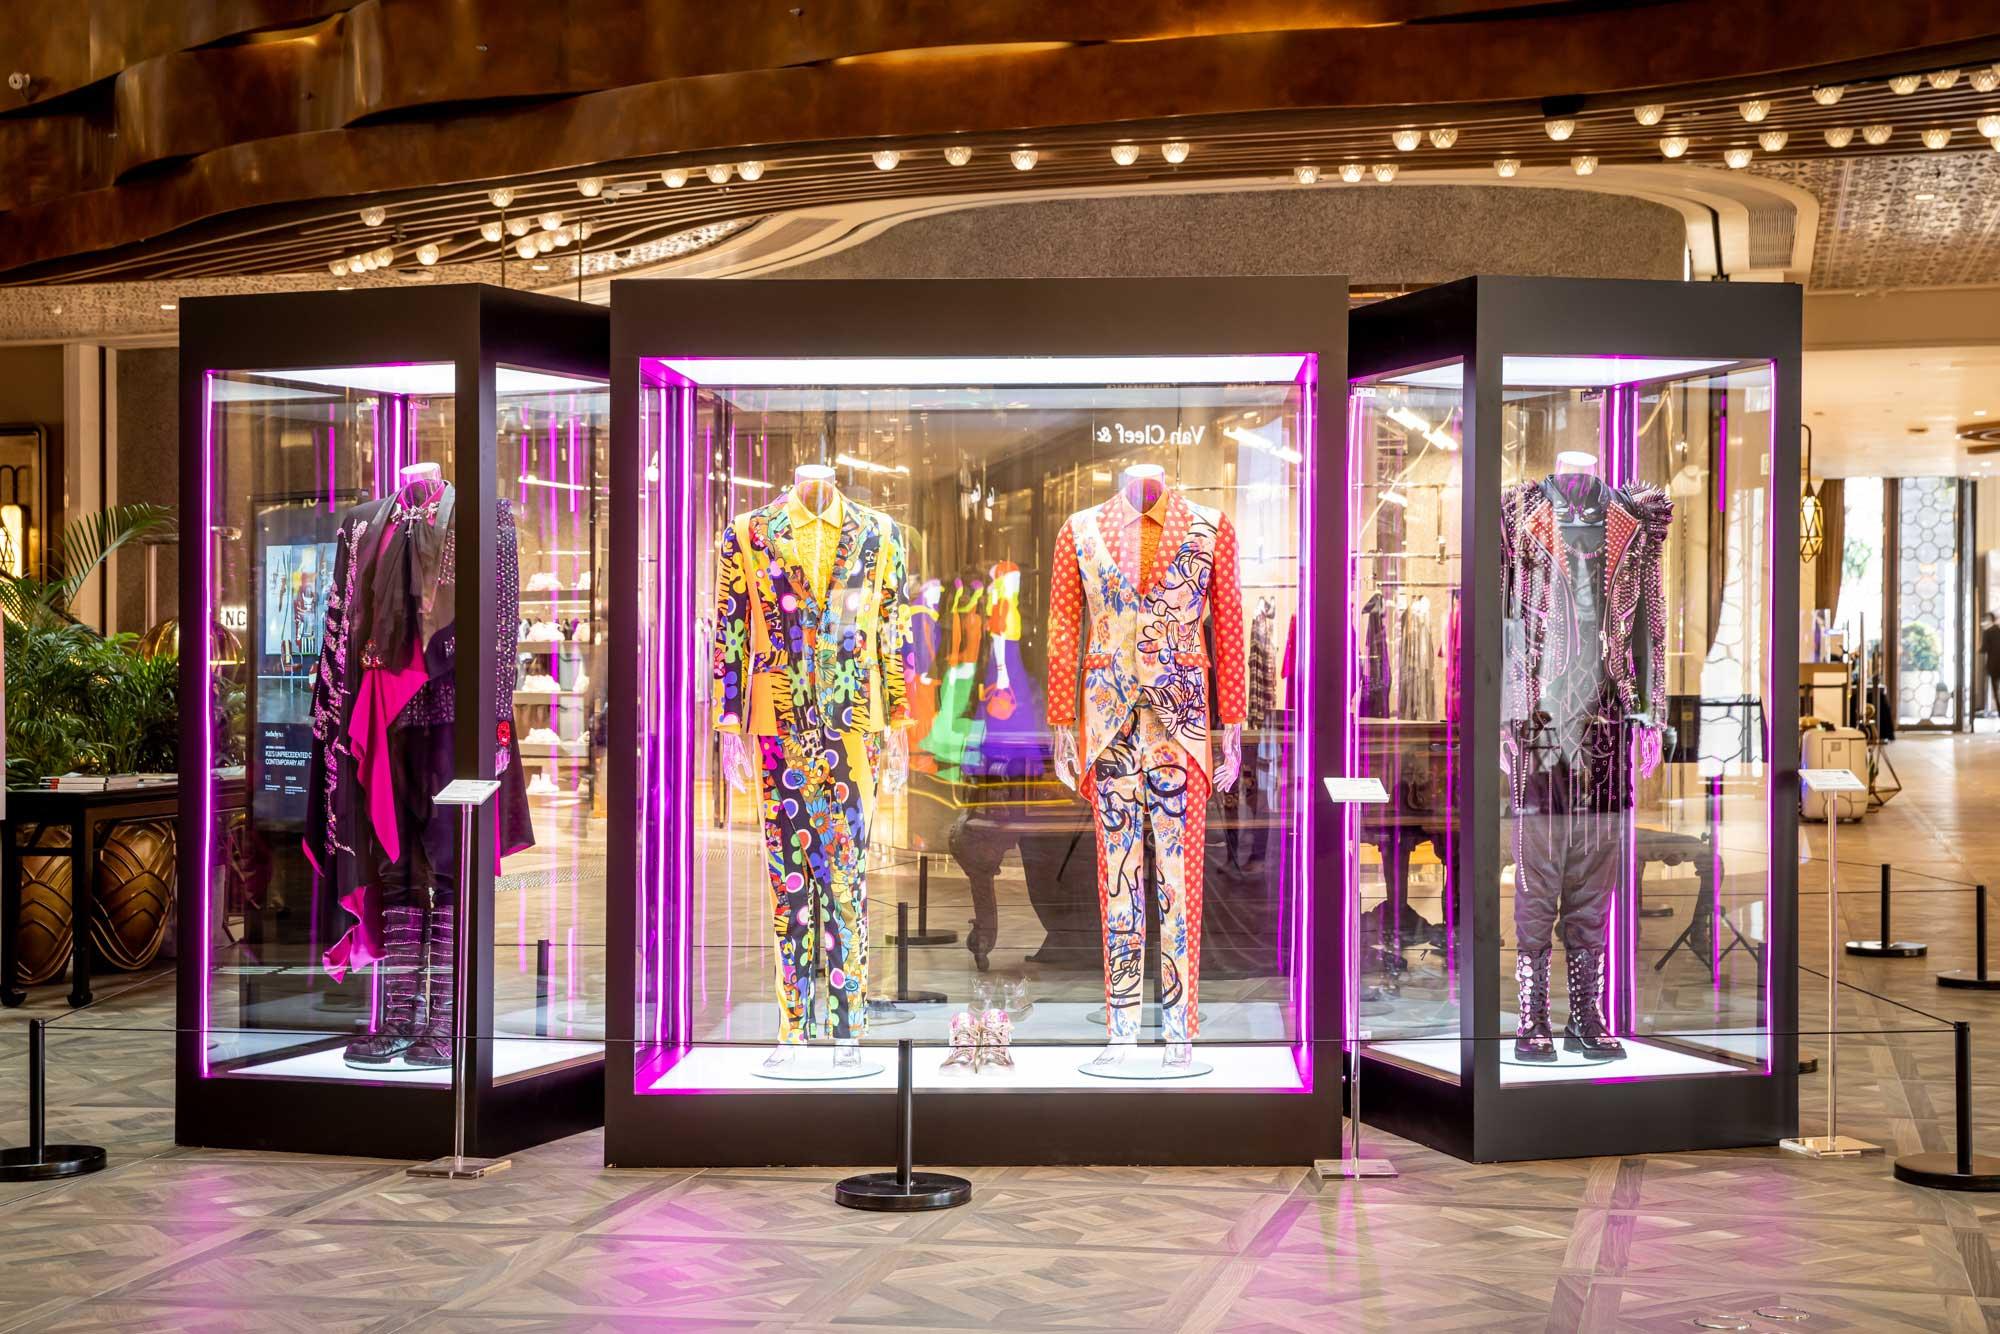 Jay's-Concert-Costumes-Set-Displaying-@K11-MUSEA.jpg